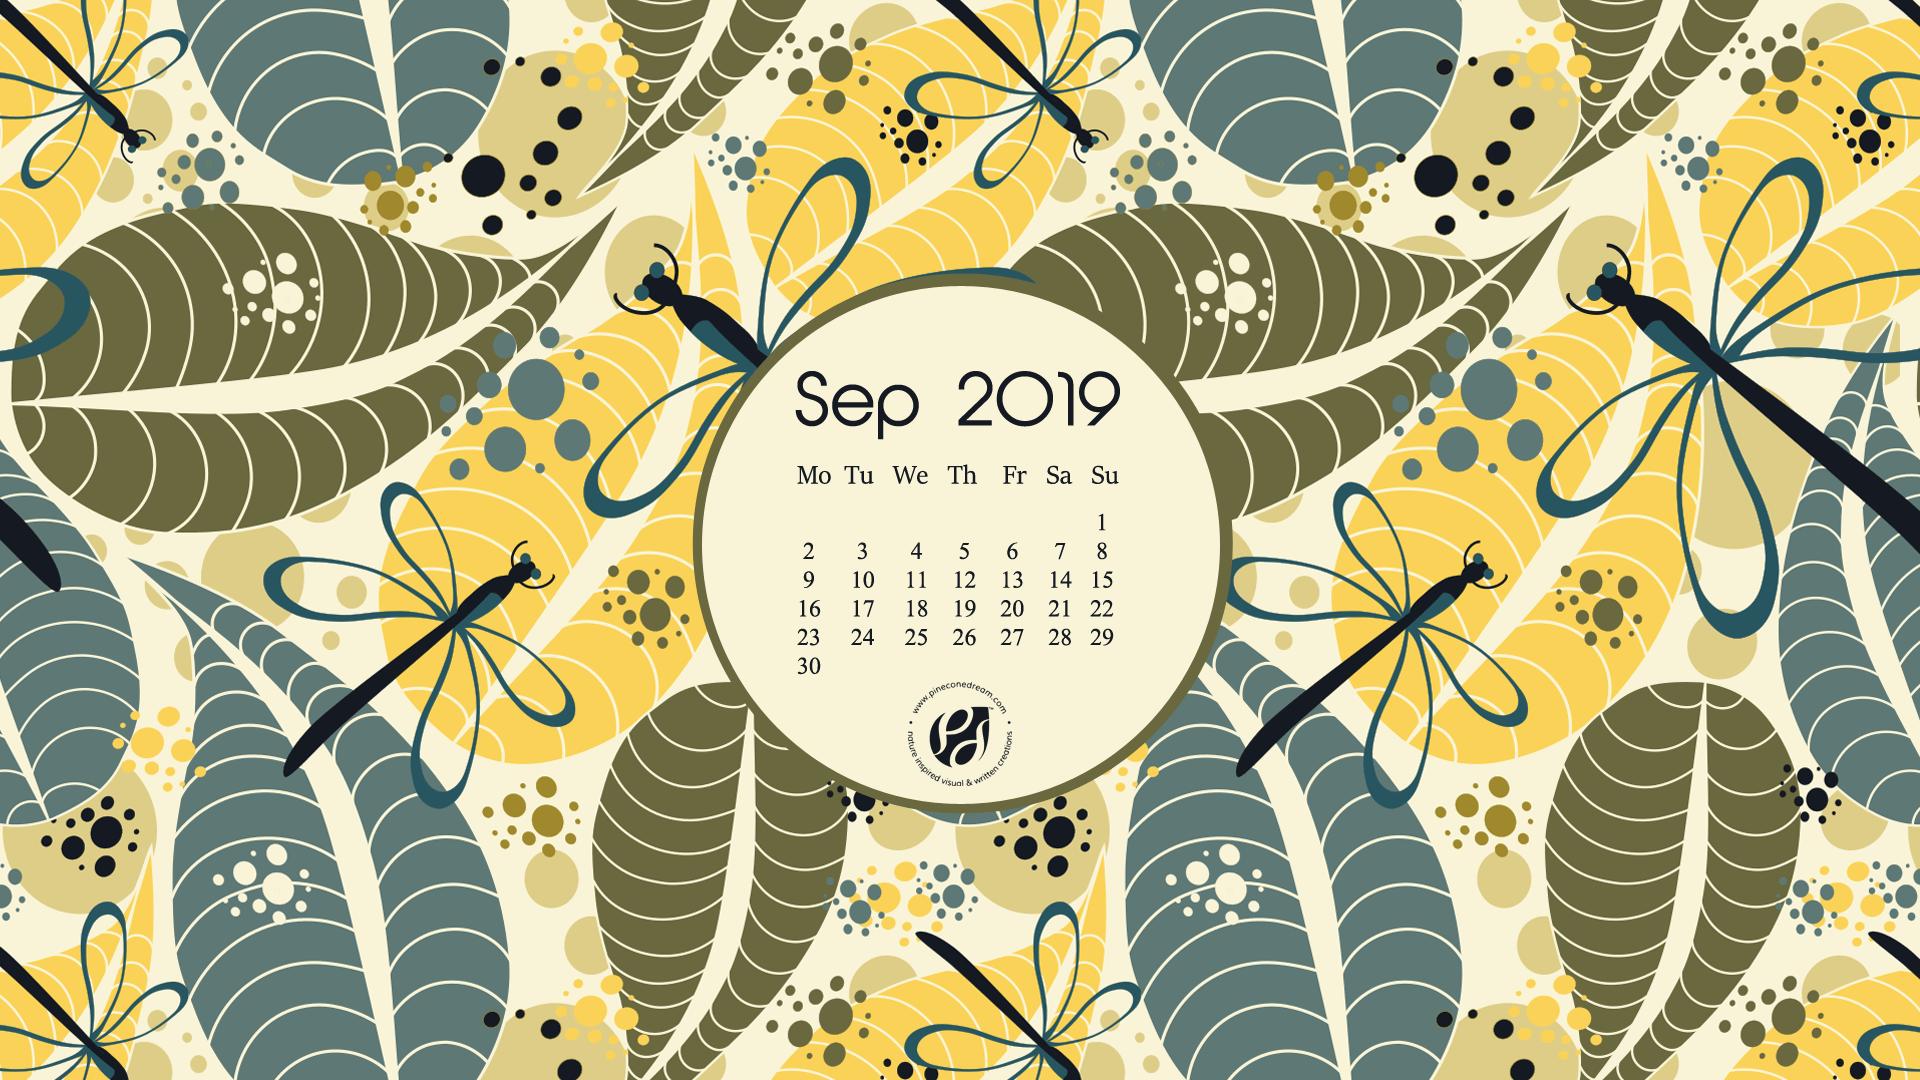 September 2019 calendar wallpapers printable planner 1920x1080